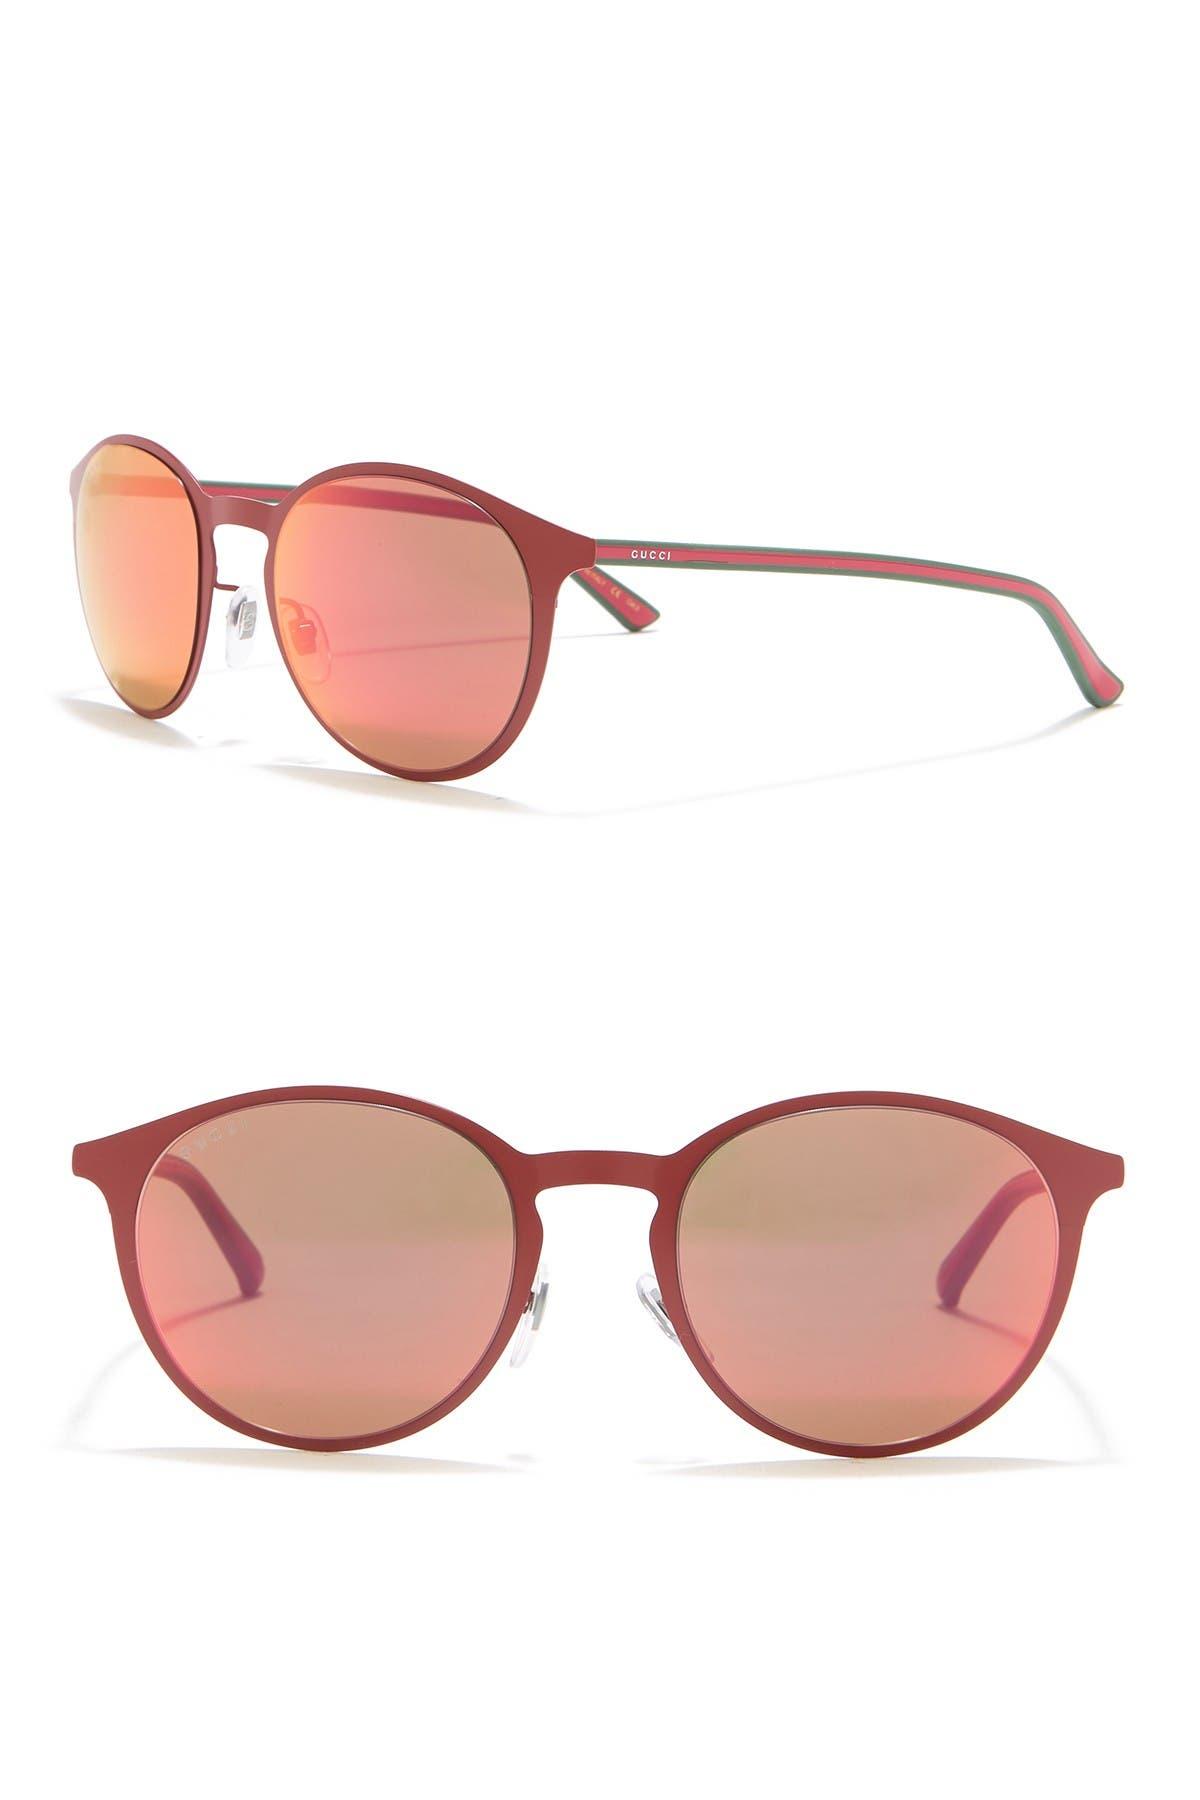 Image of GUCCI 52mm Round Sunglasses